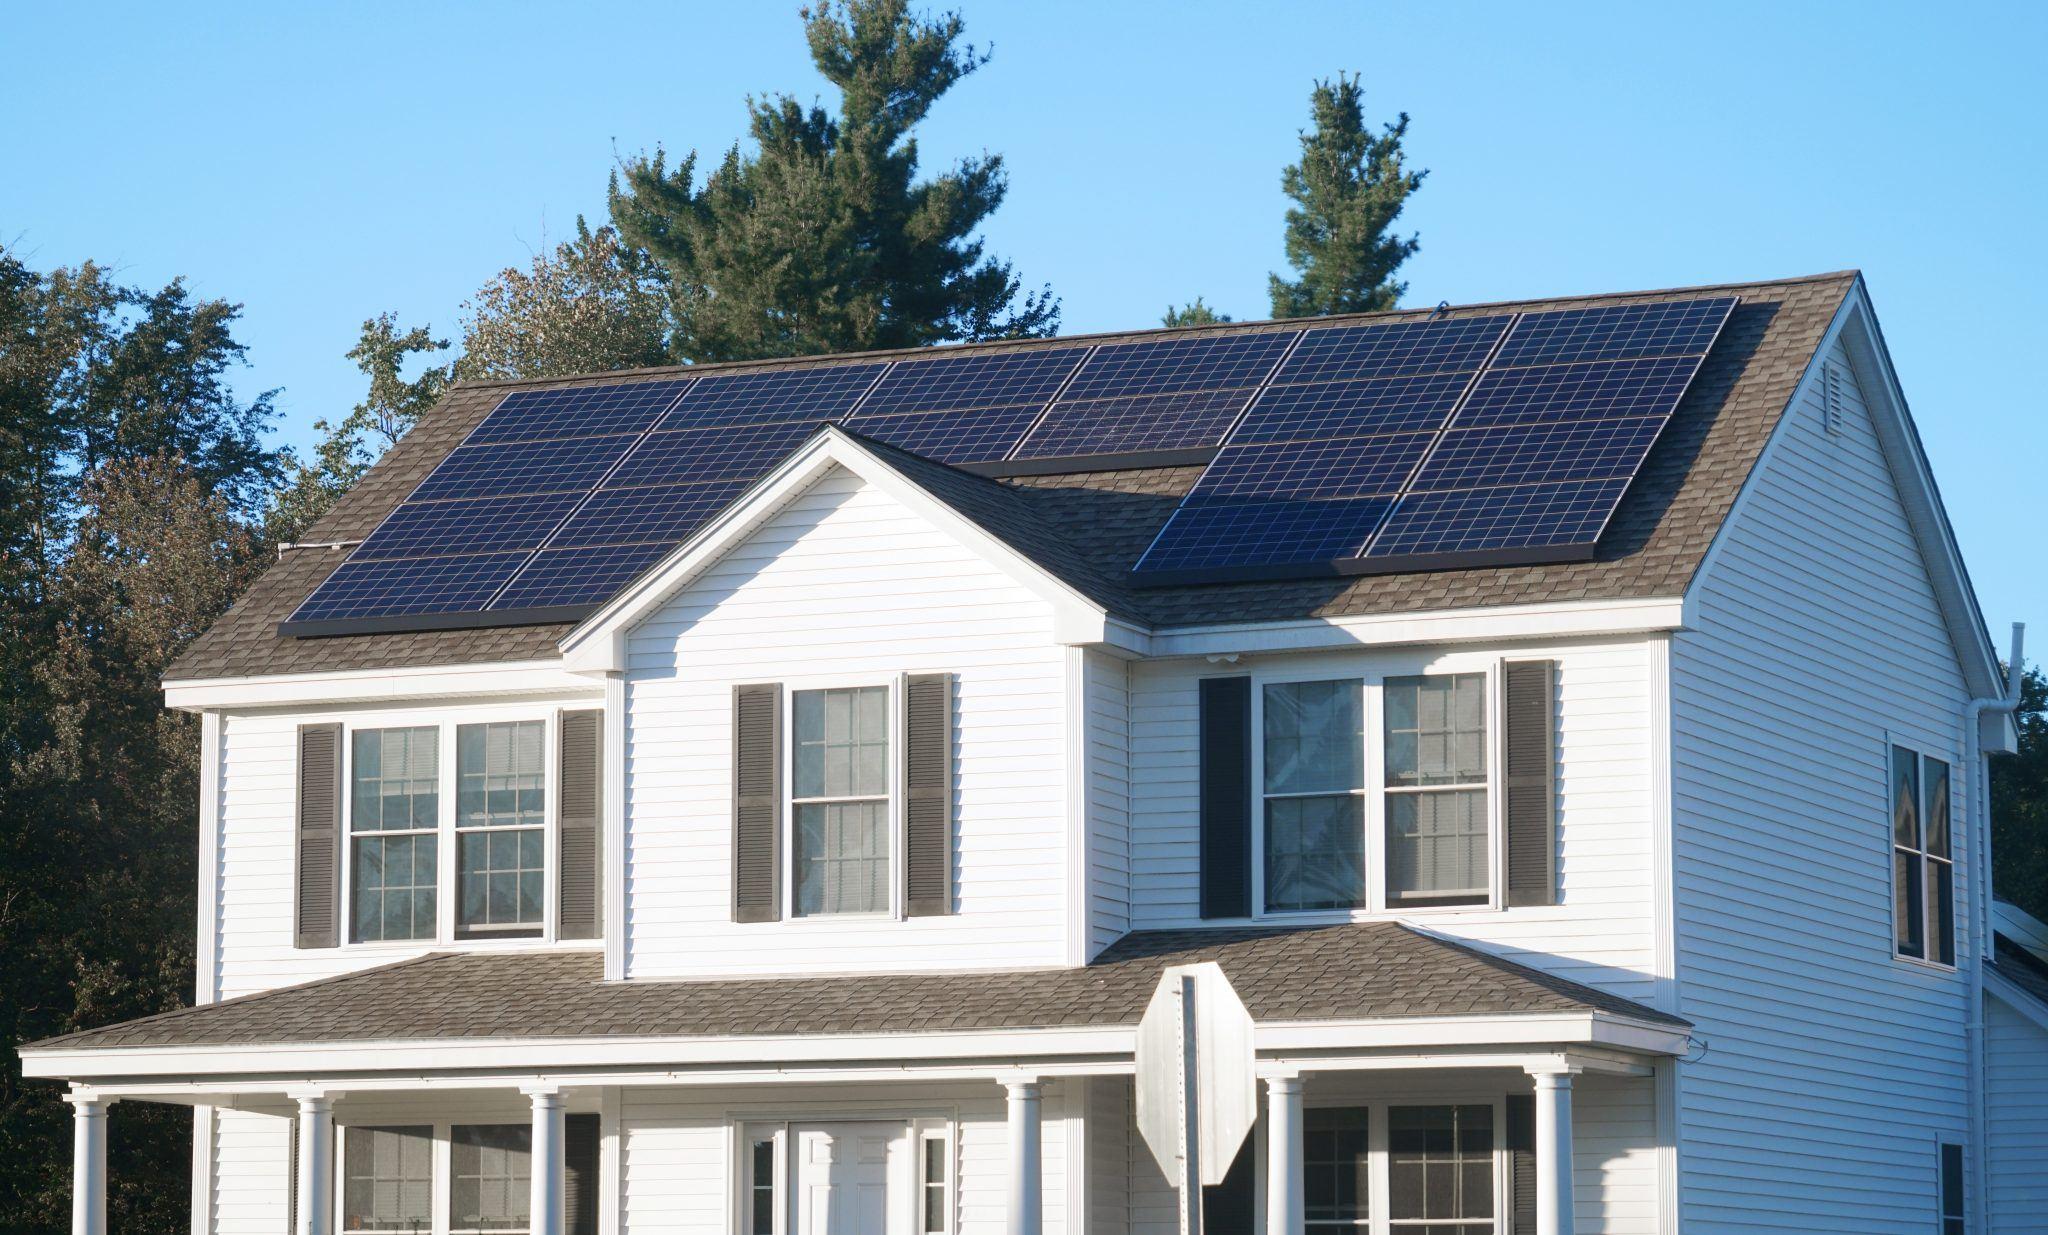 How Many Solar Panels Would I Need to Power My House?